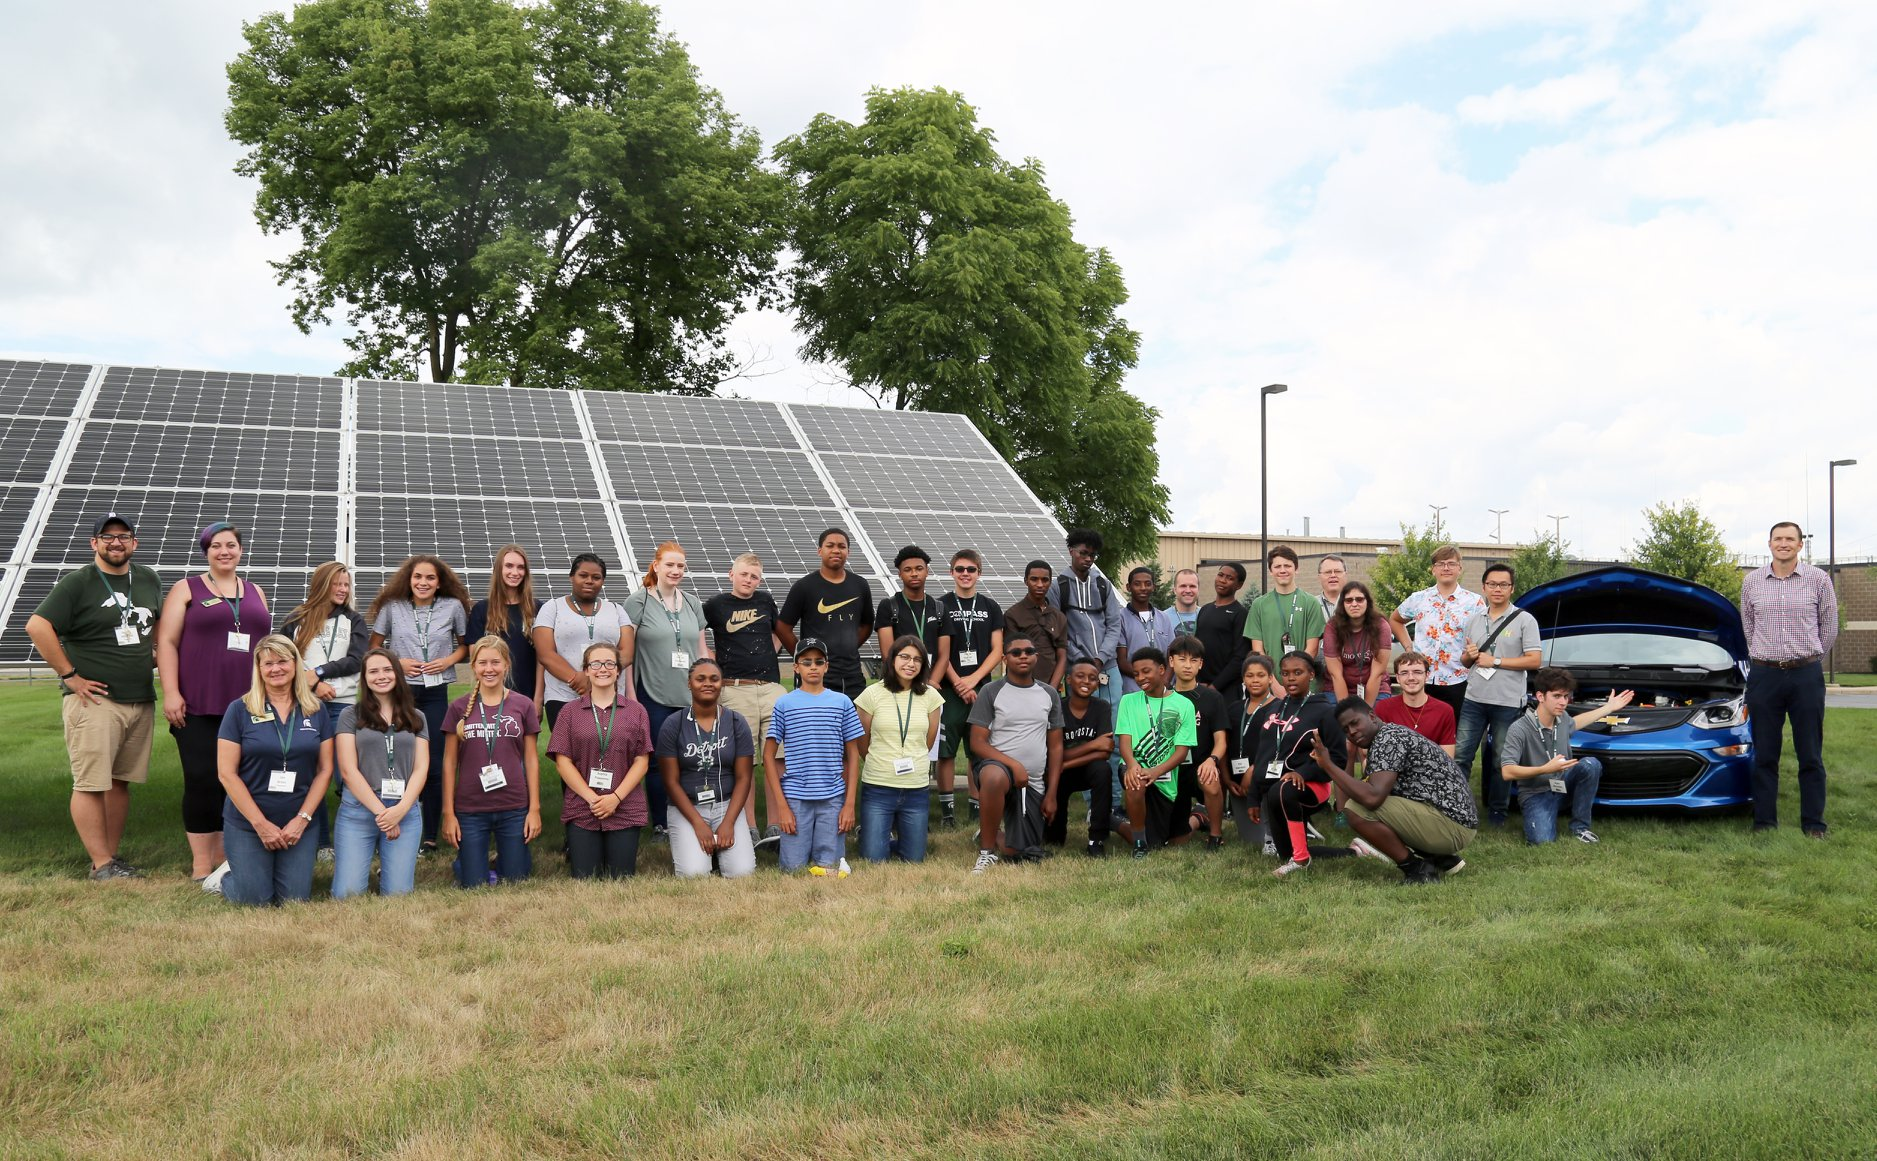 2018 Renewable Energy Camp